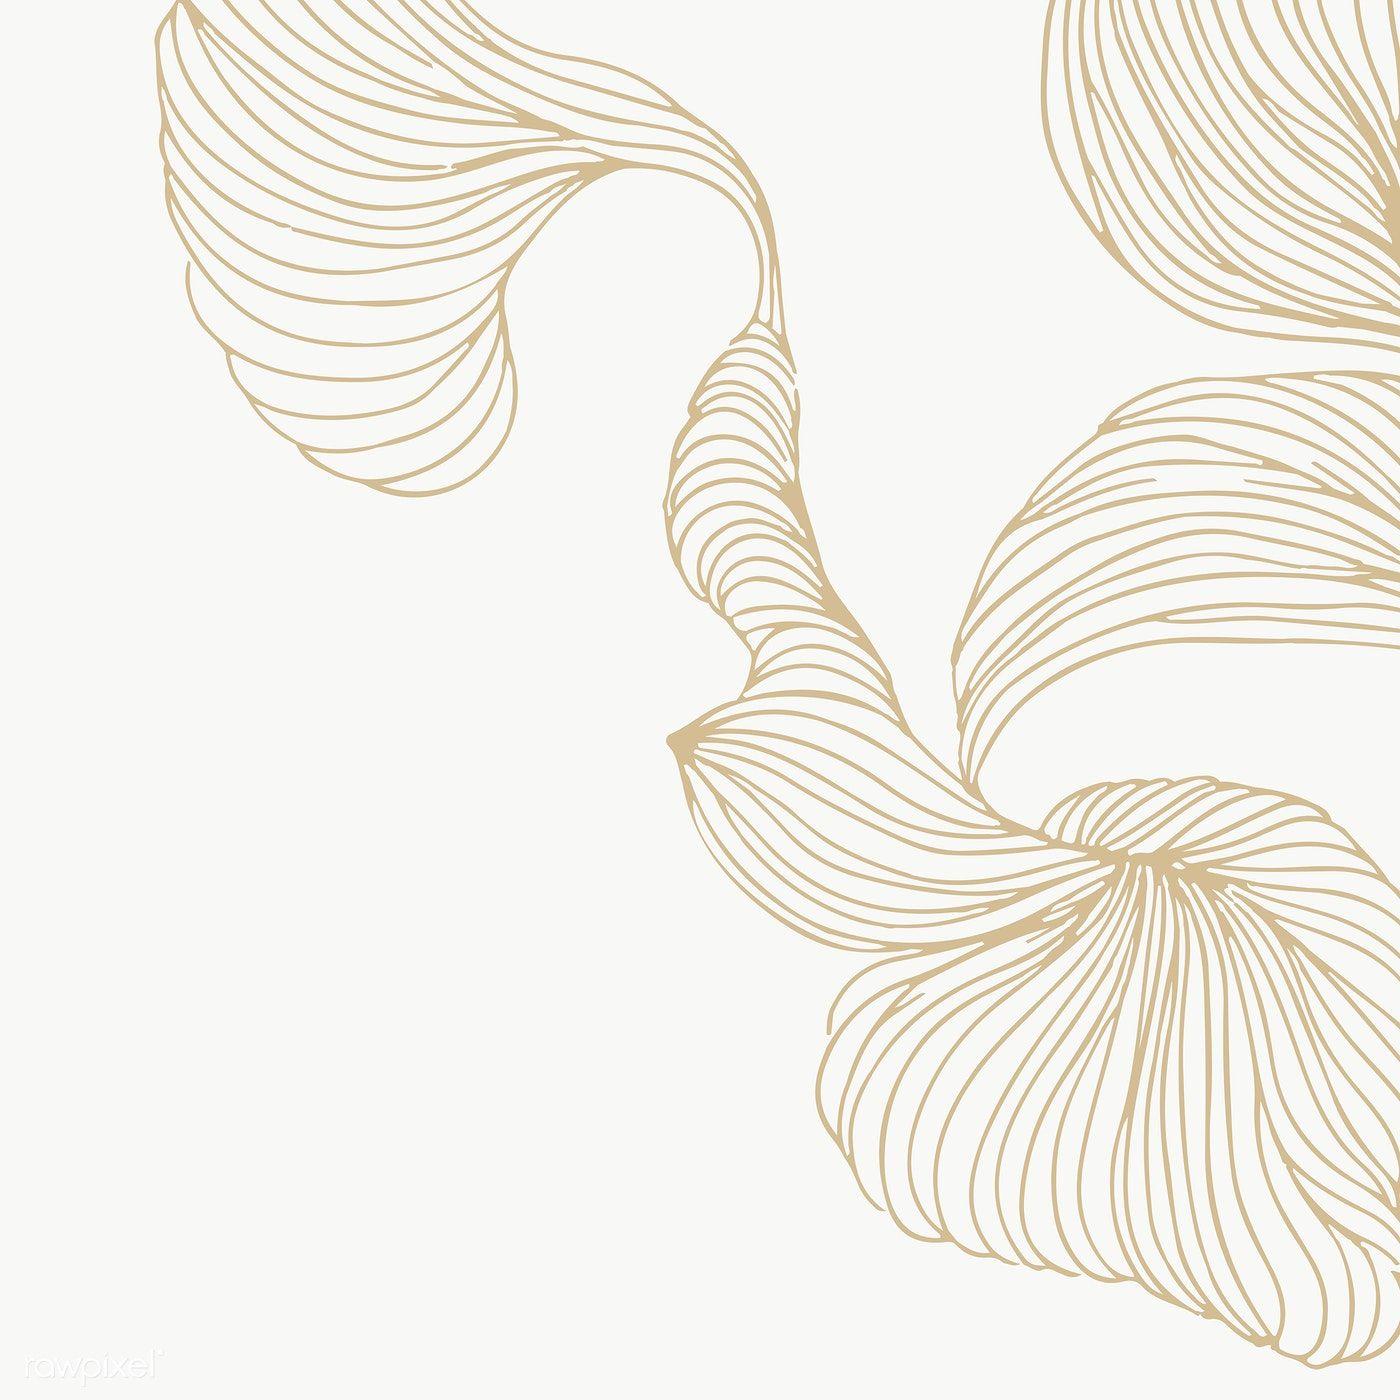 Beige Swirly Line Frame Design Transparent Png Premium Image By Rawpixel Com Adj Frame Design Line Art Flowers Abstract Lines